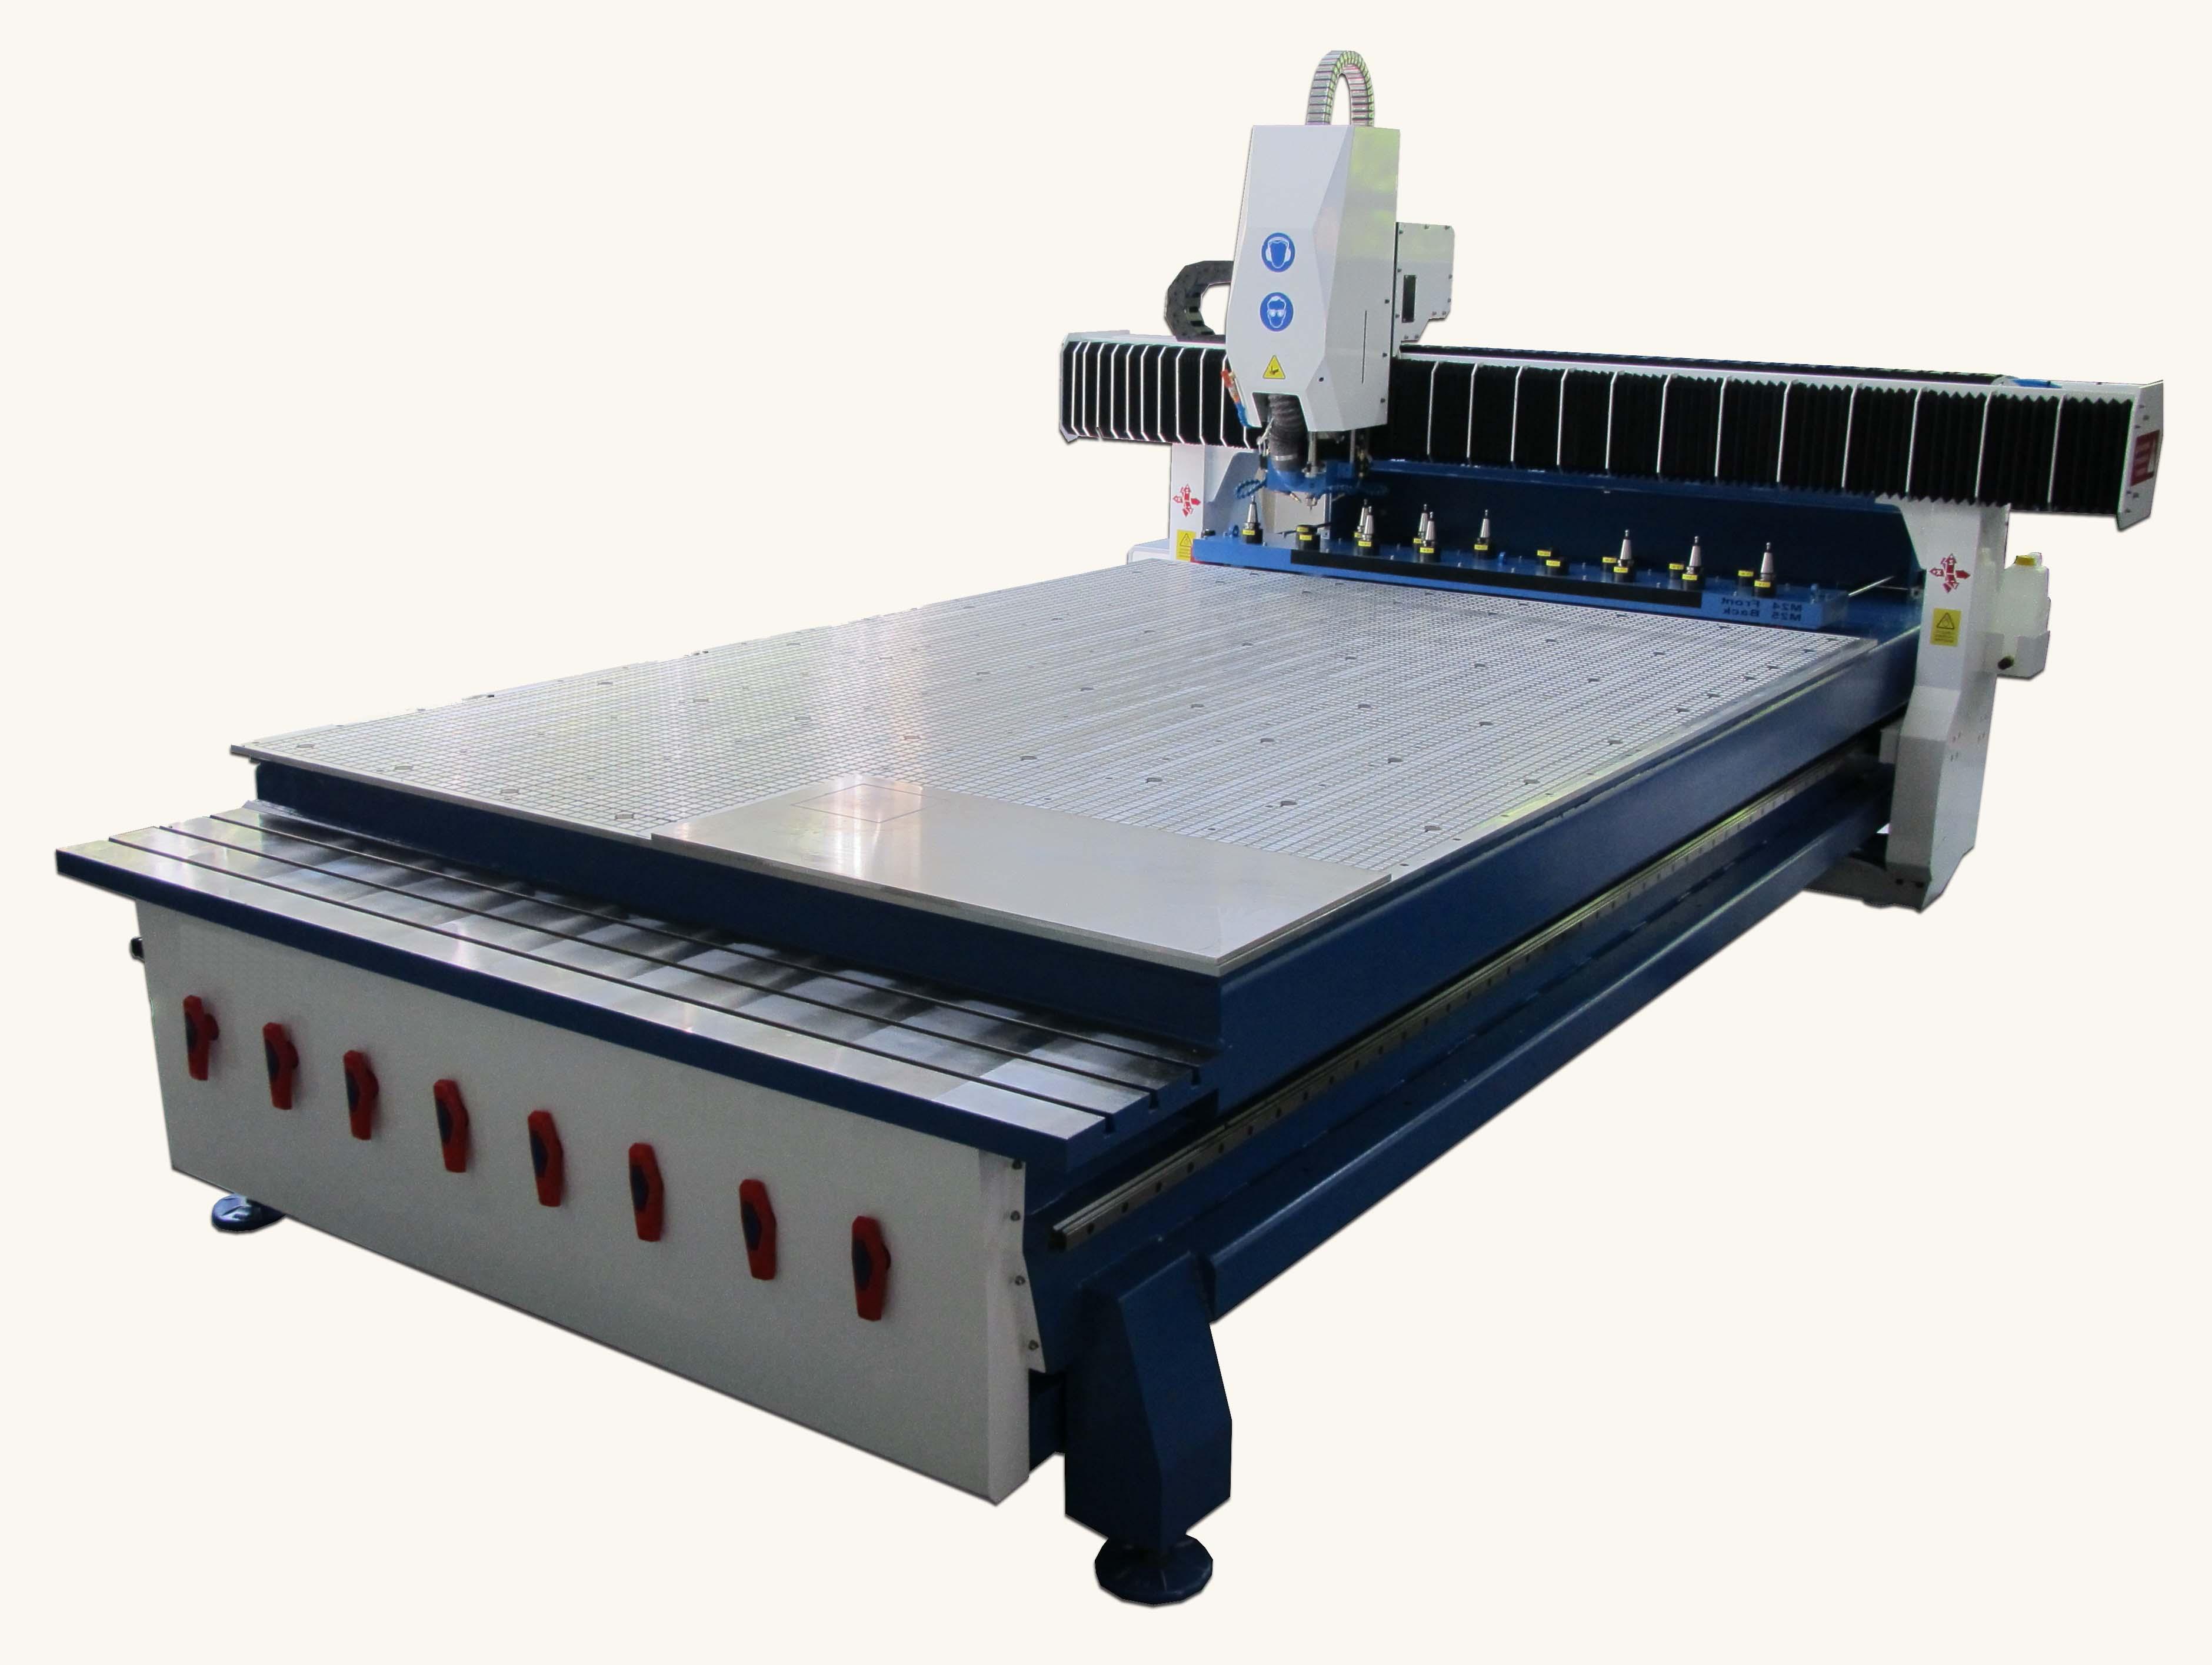 CNC Maschine SkyCNC WM 2030 Frässystem